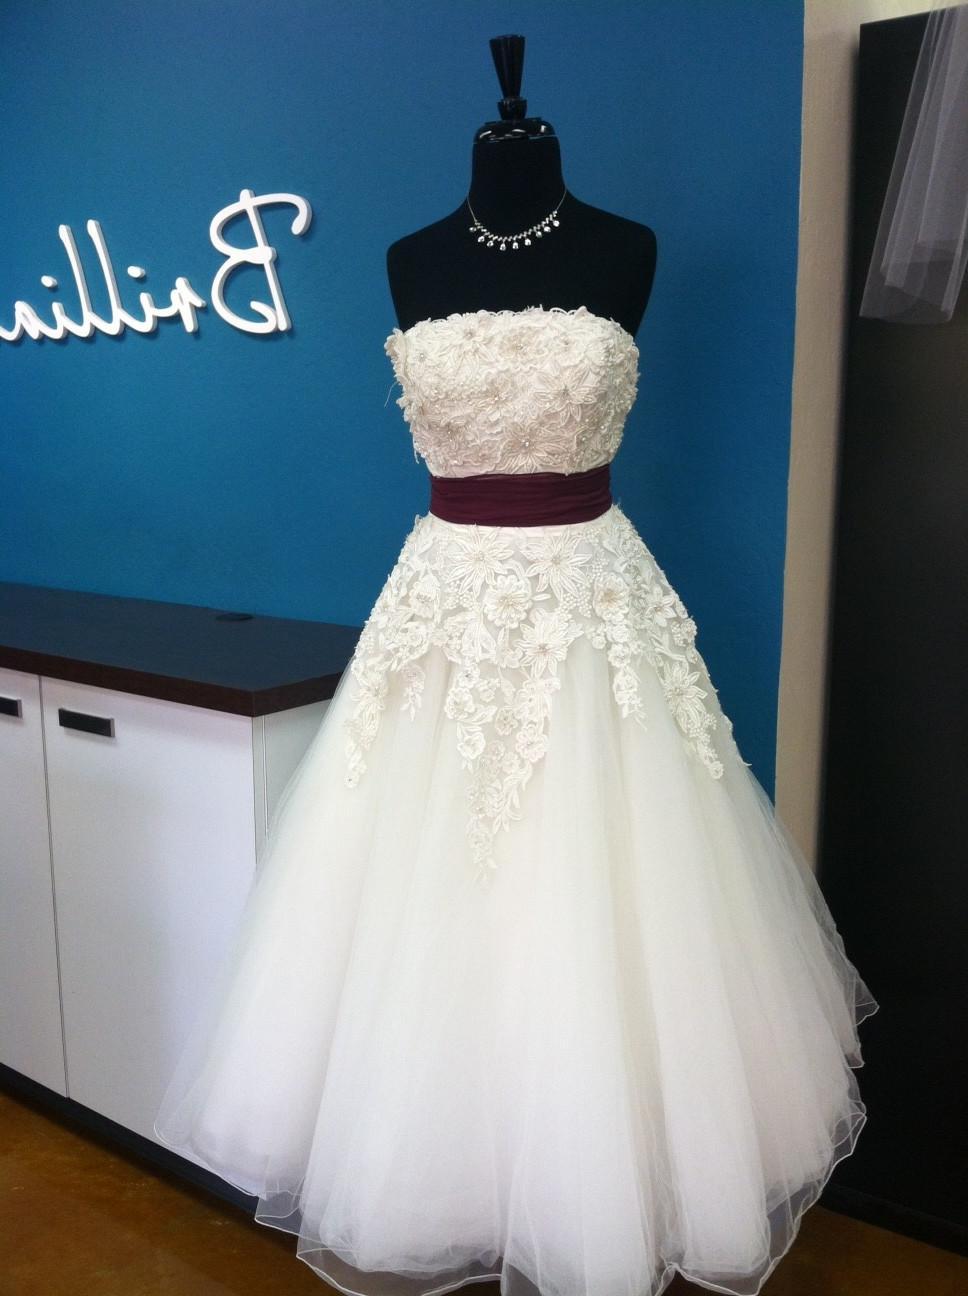 Kandaces Blog 1 Mannequin Weddings Dresses